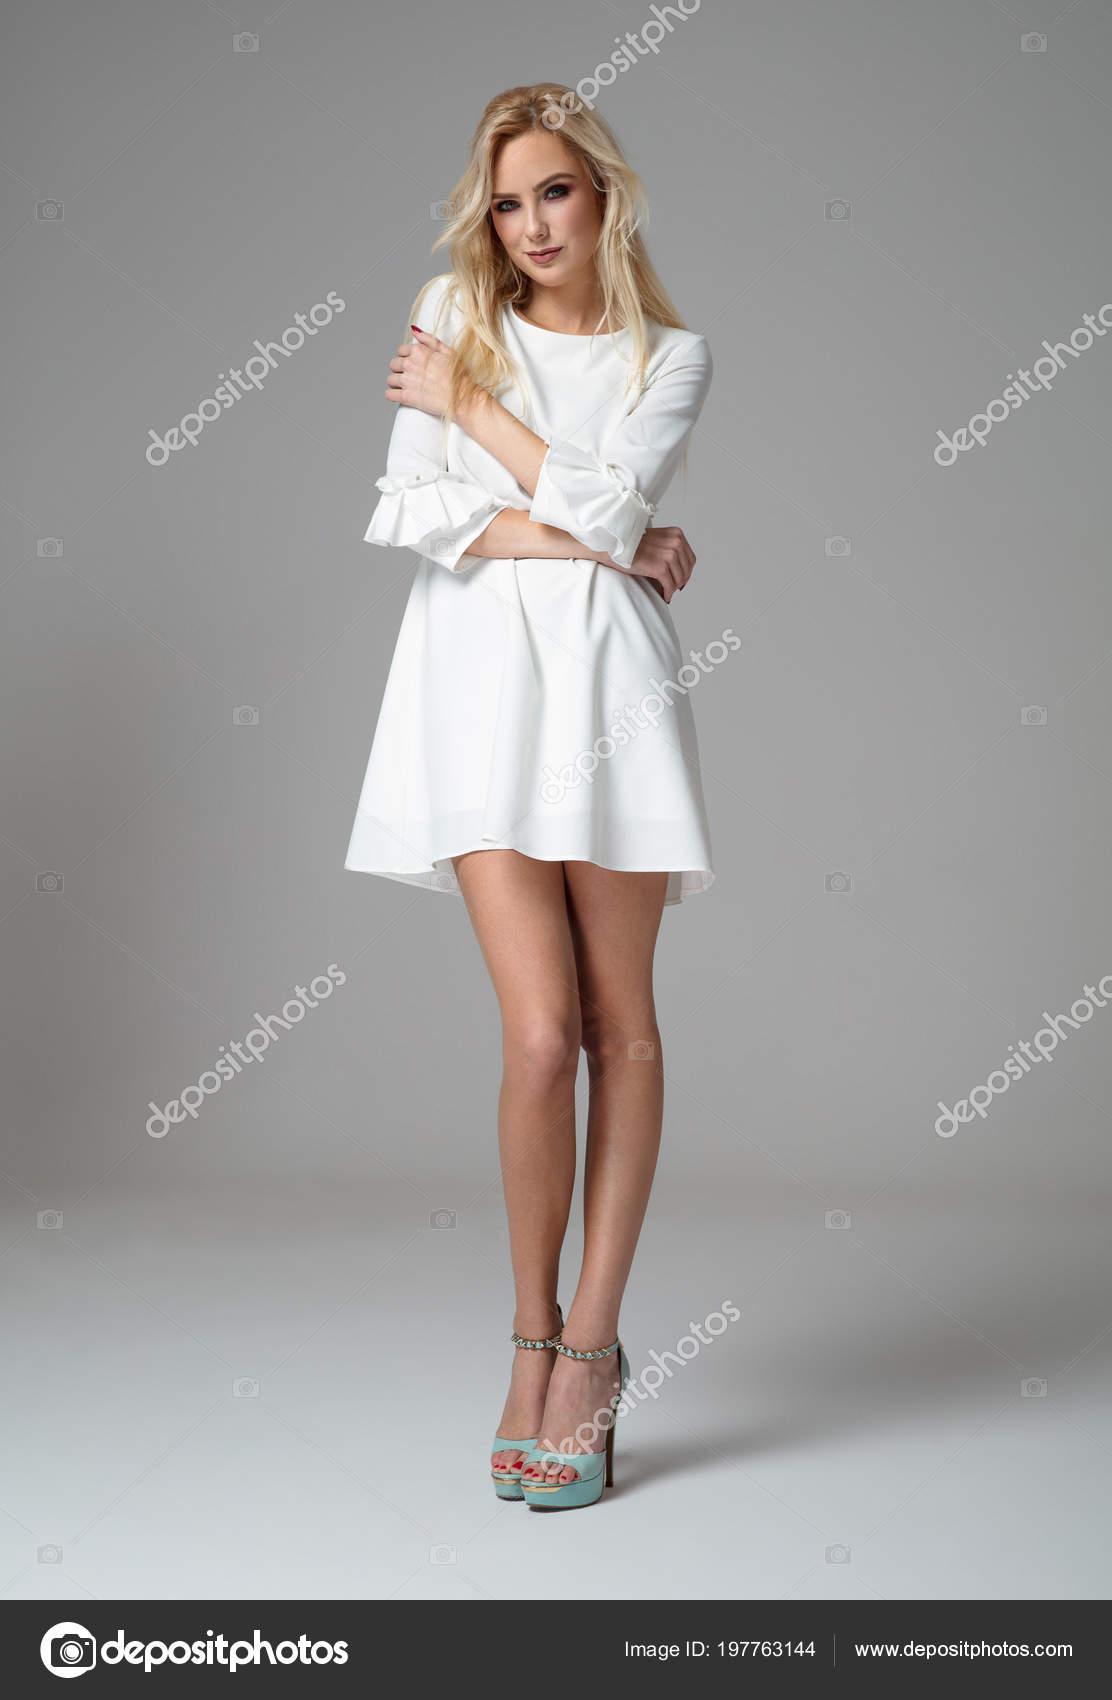 007272f06 Beautiful blond woman wear white dress and posing in studio– stock image